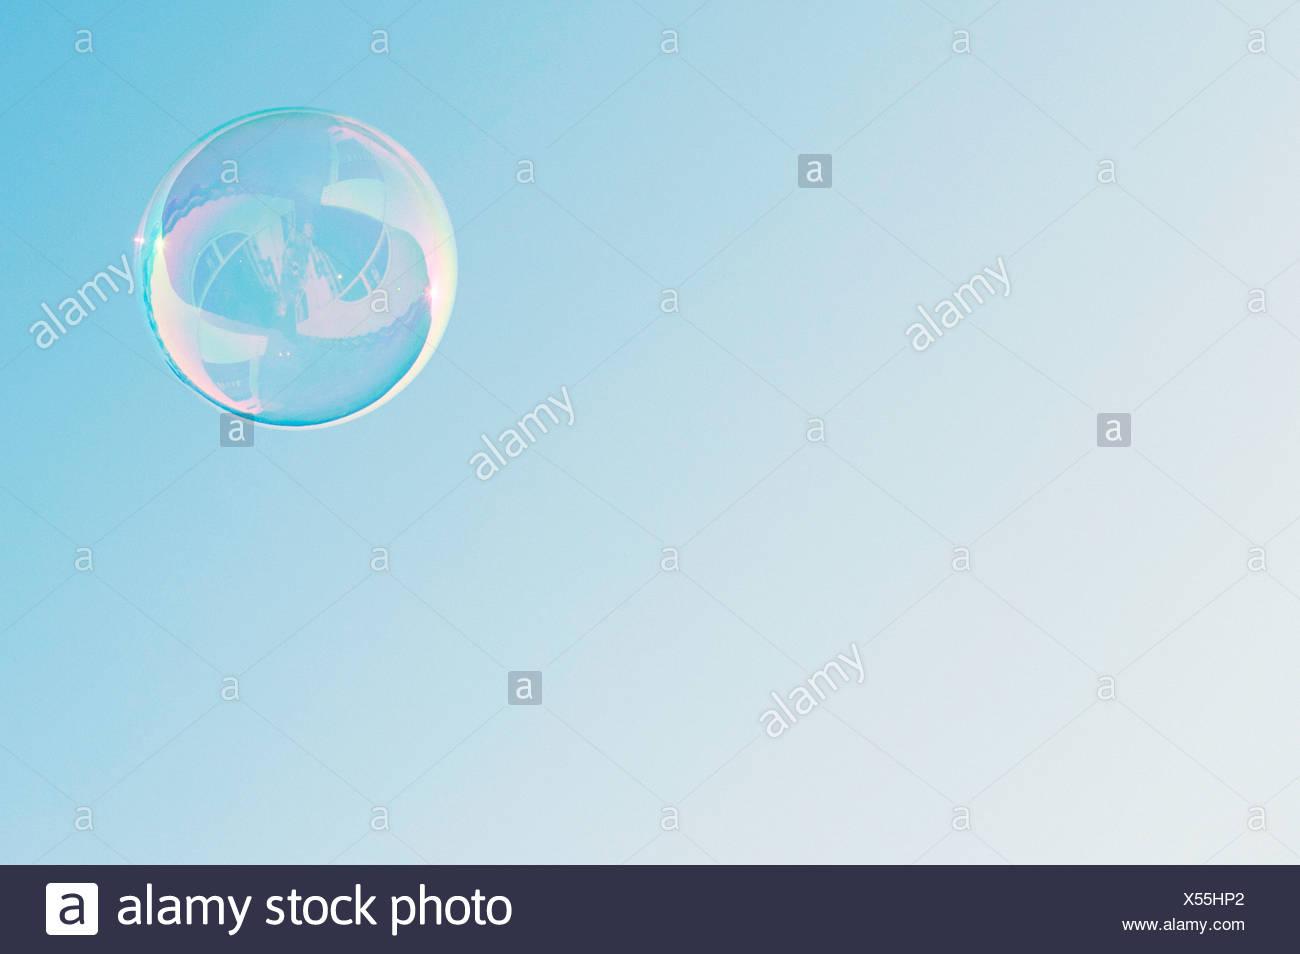 Low angle view of bubble contre ciel bleu clair Photo Stock